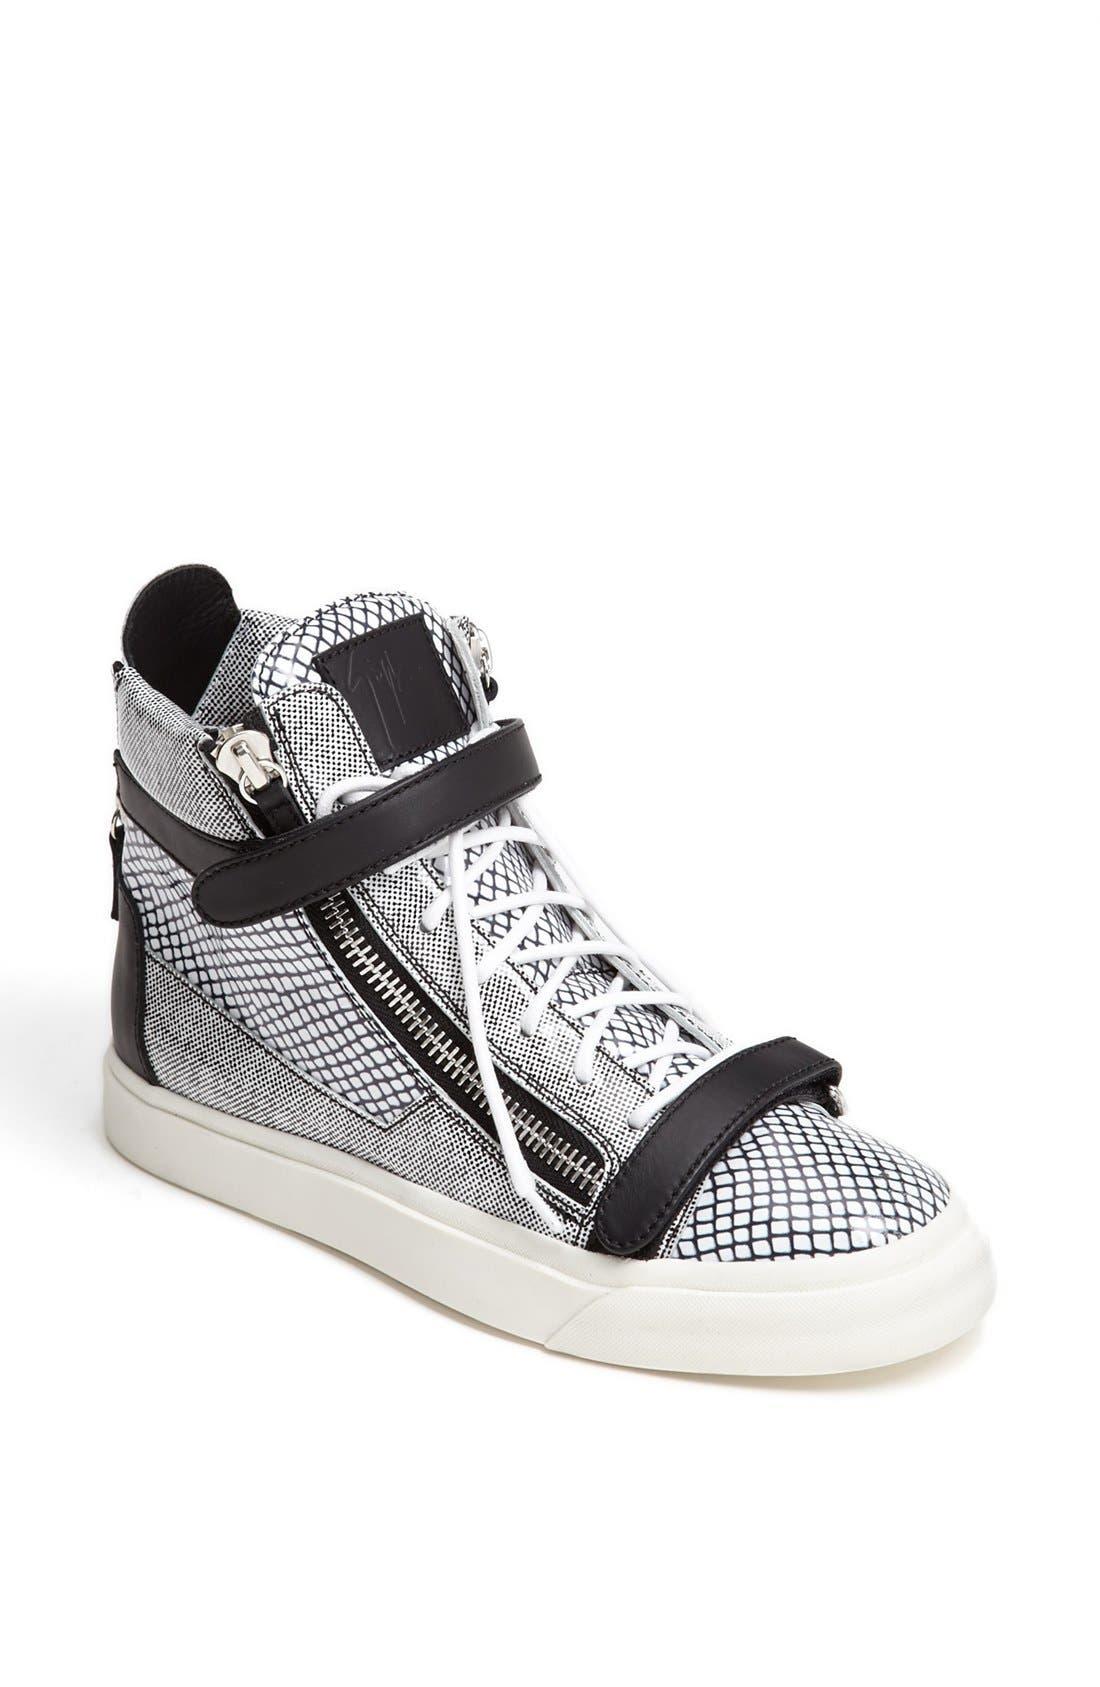 Alternate Image 1 Selected - Giuseppe Zanotti High Top Sneaker